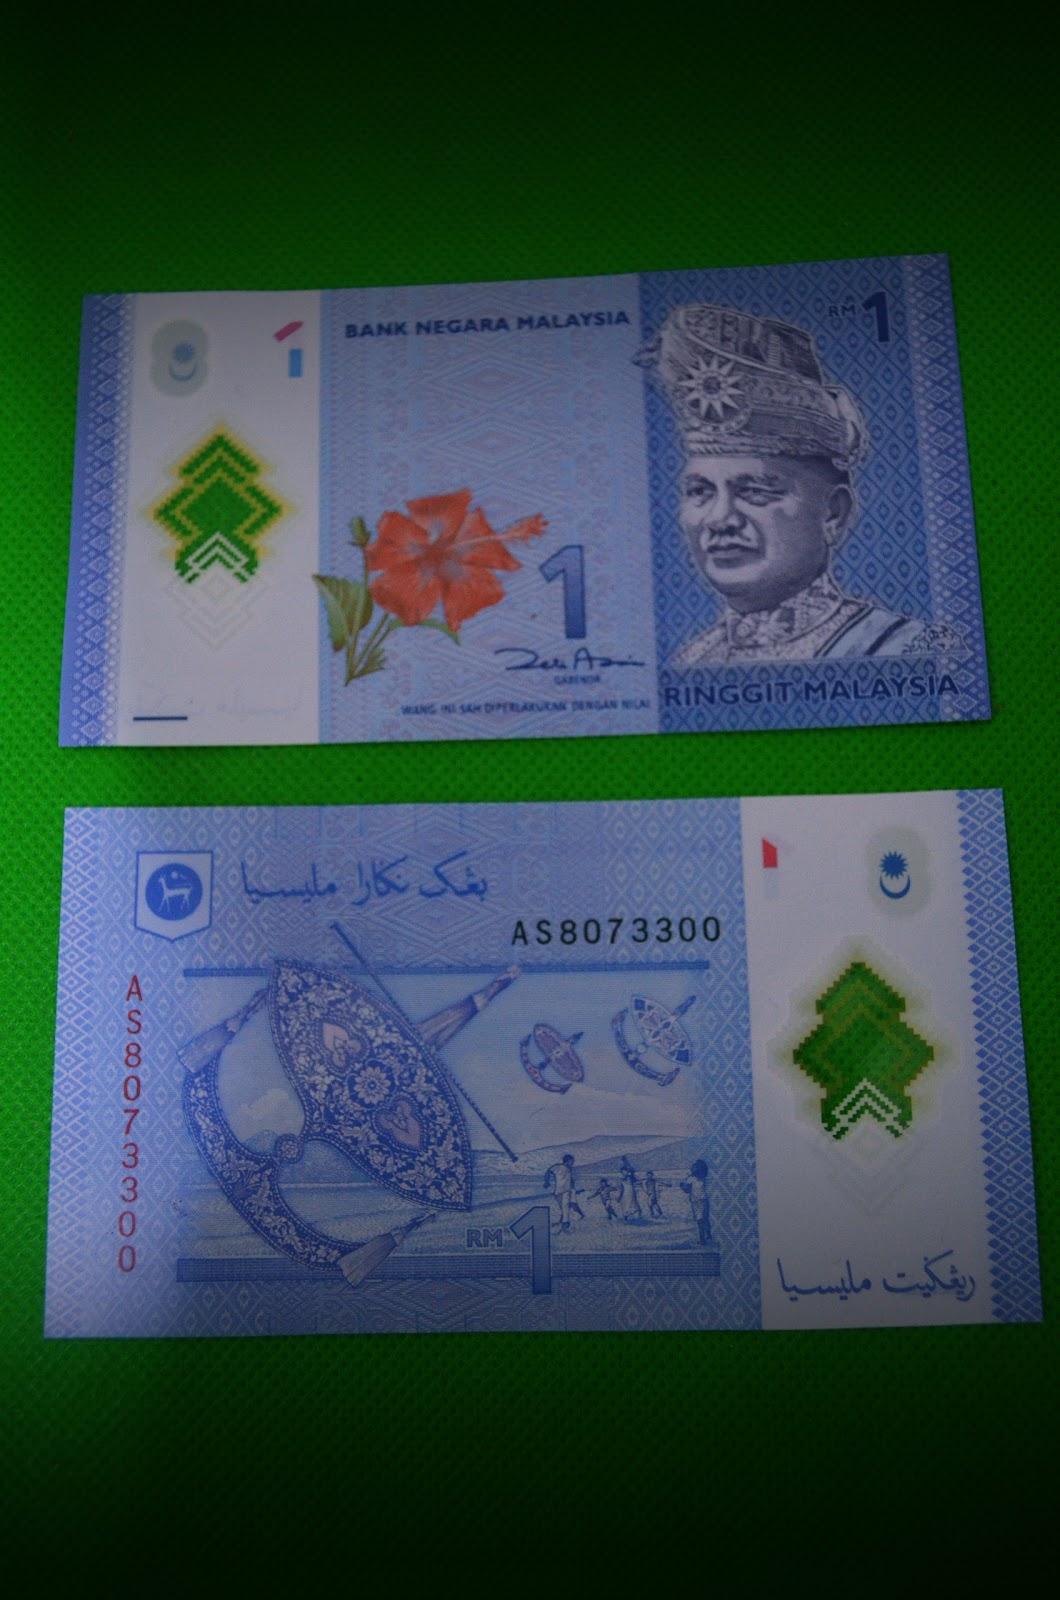 duit raya, rm1, duit seringgit baru 2012, duit rm1,